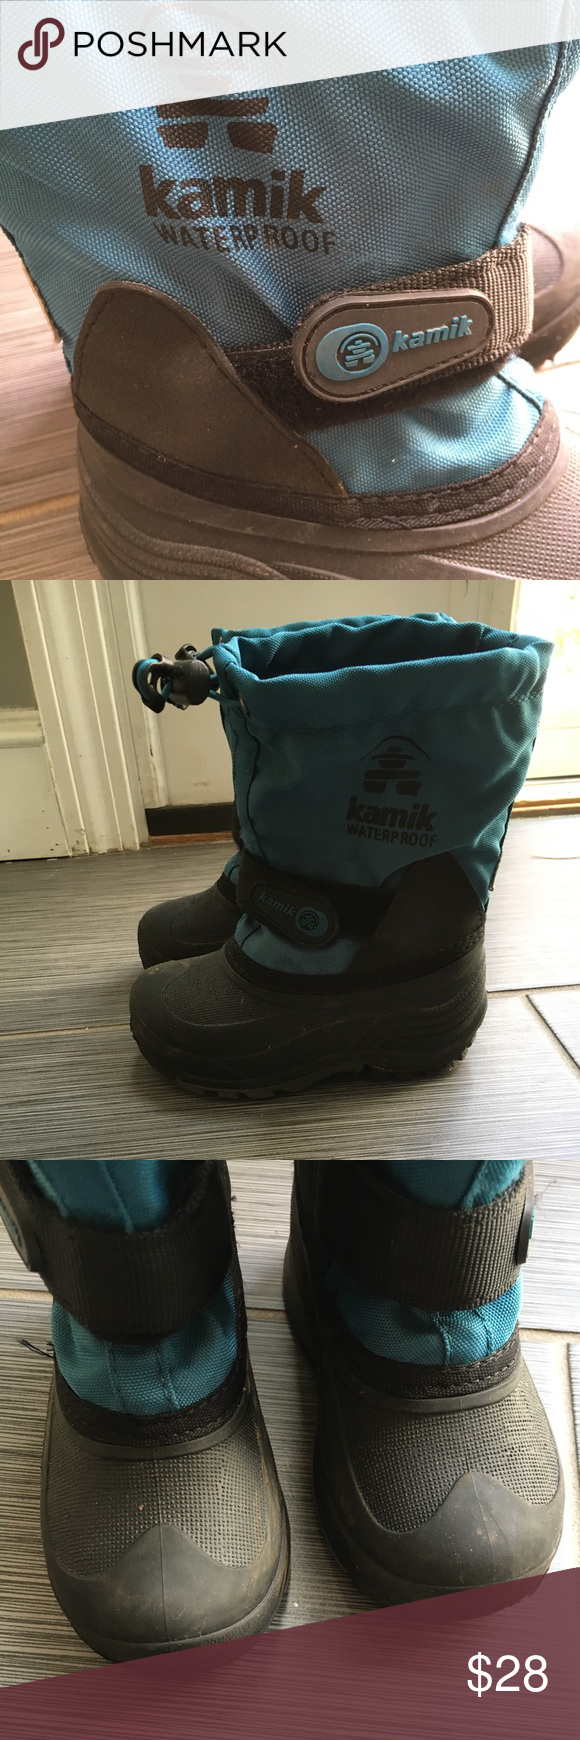 Kamik boys bluish green snow boots Worn